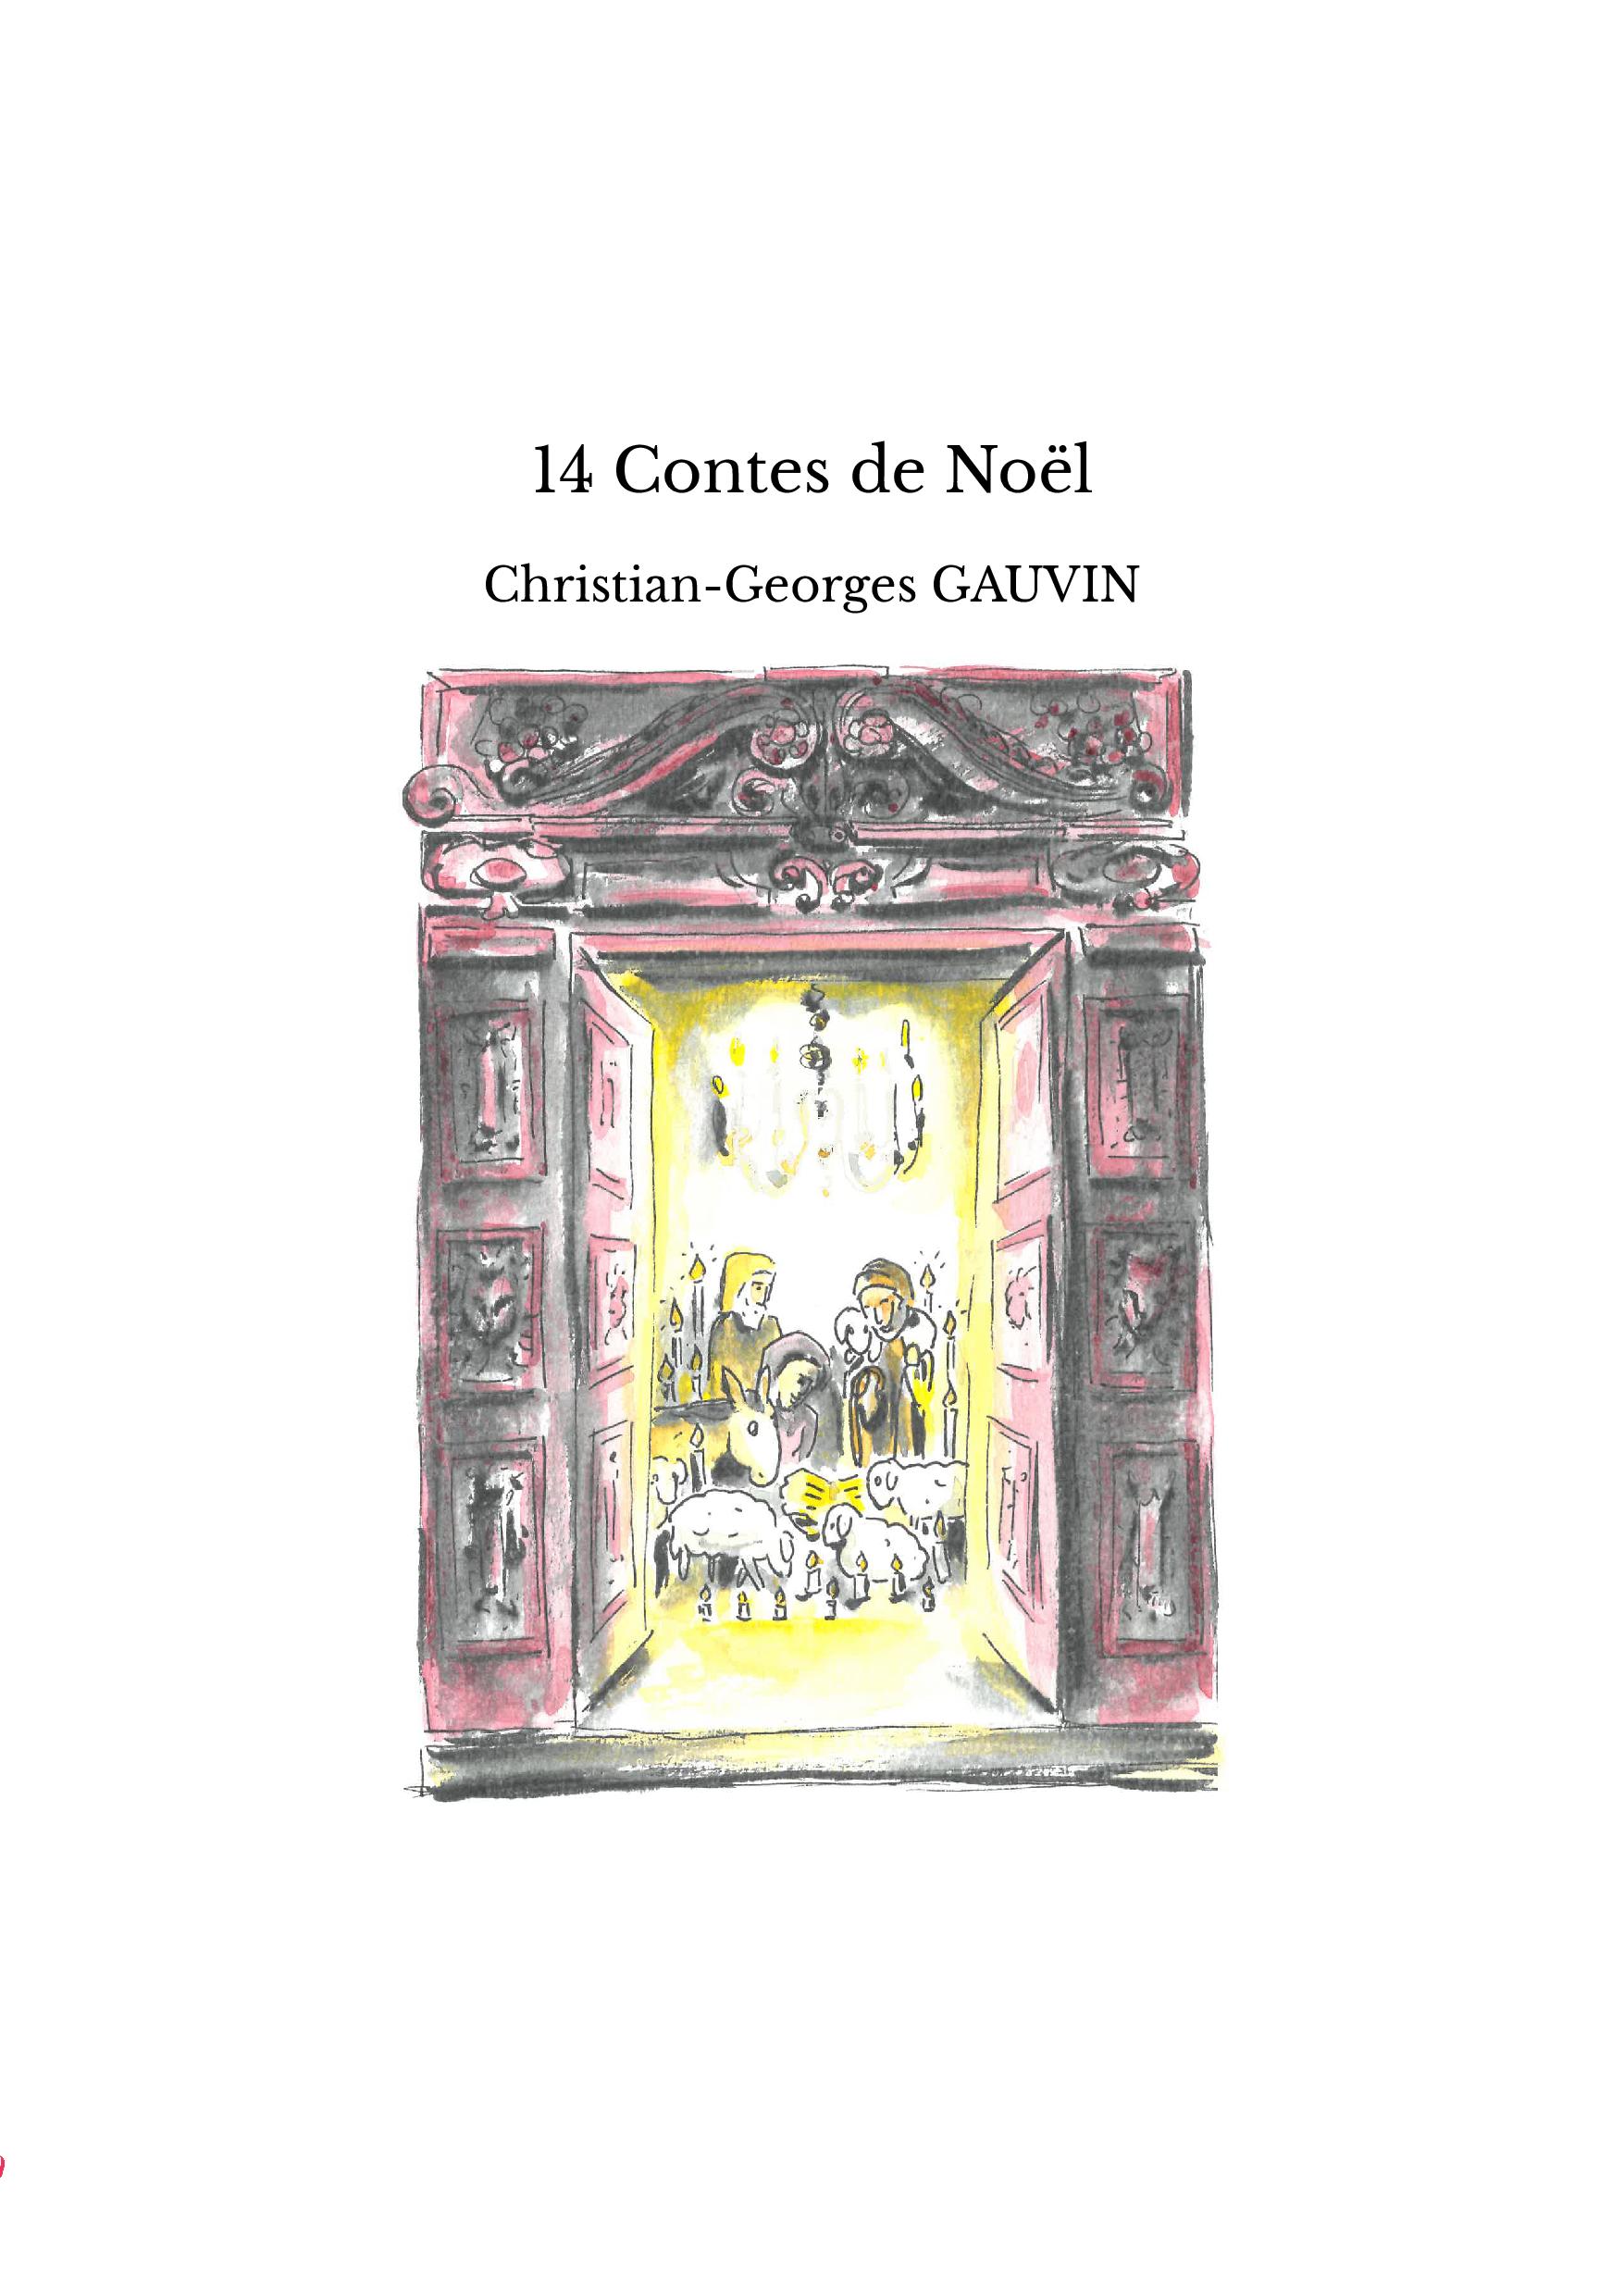 14 Contes de Noël